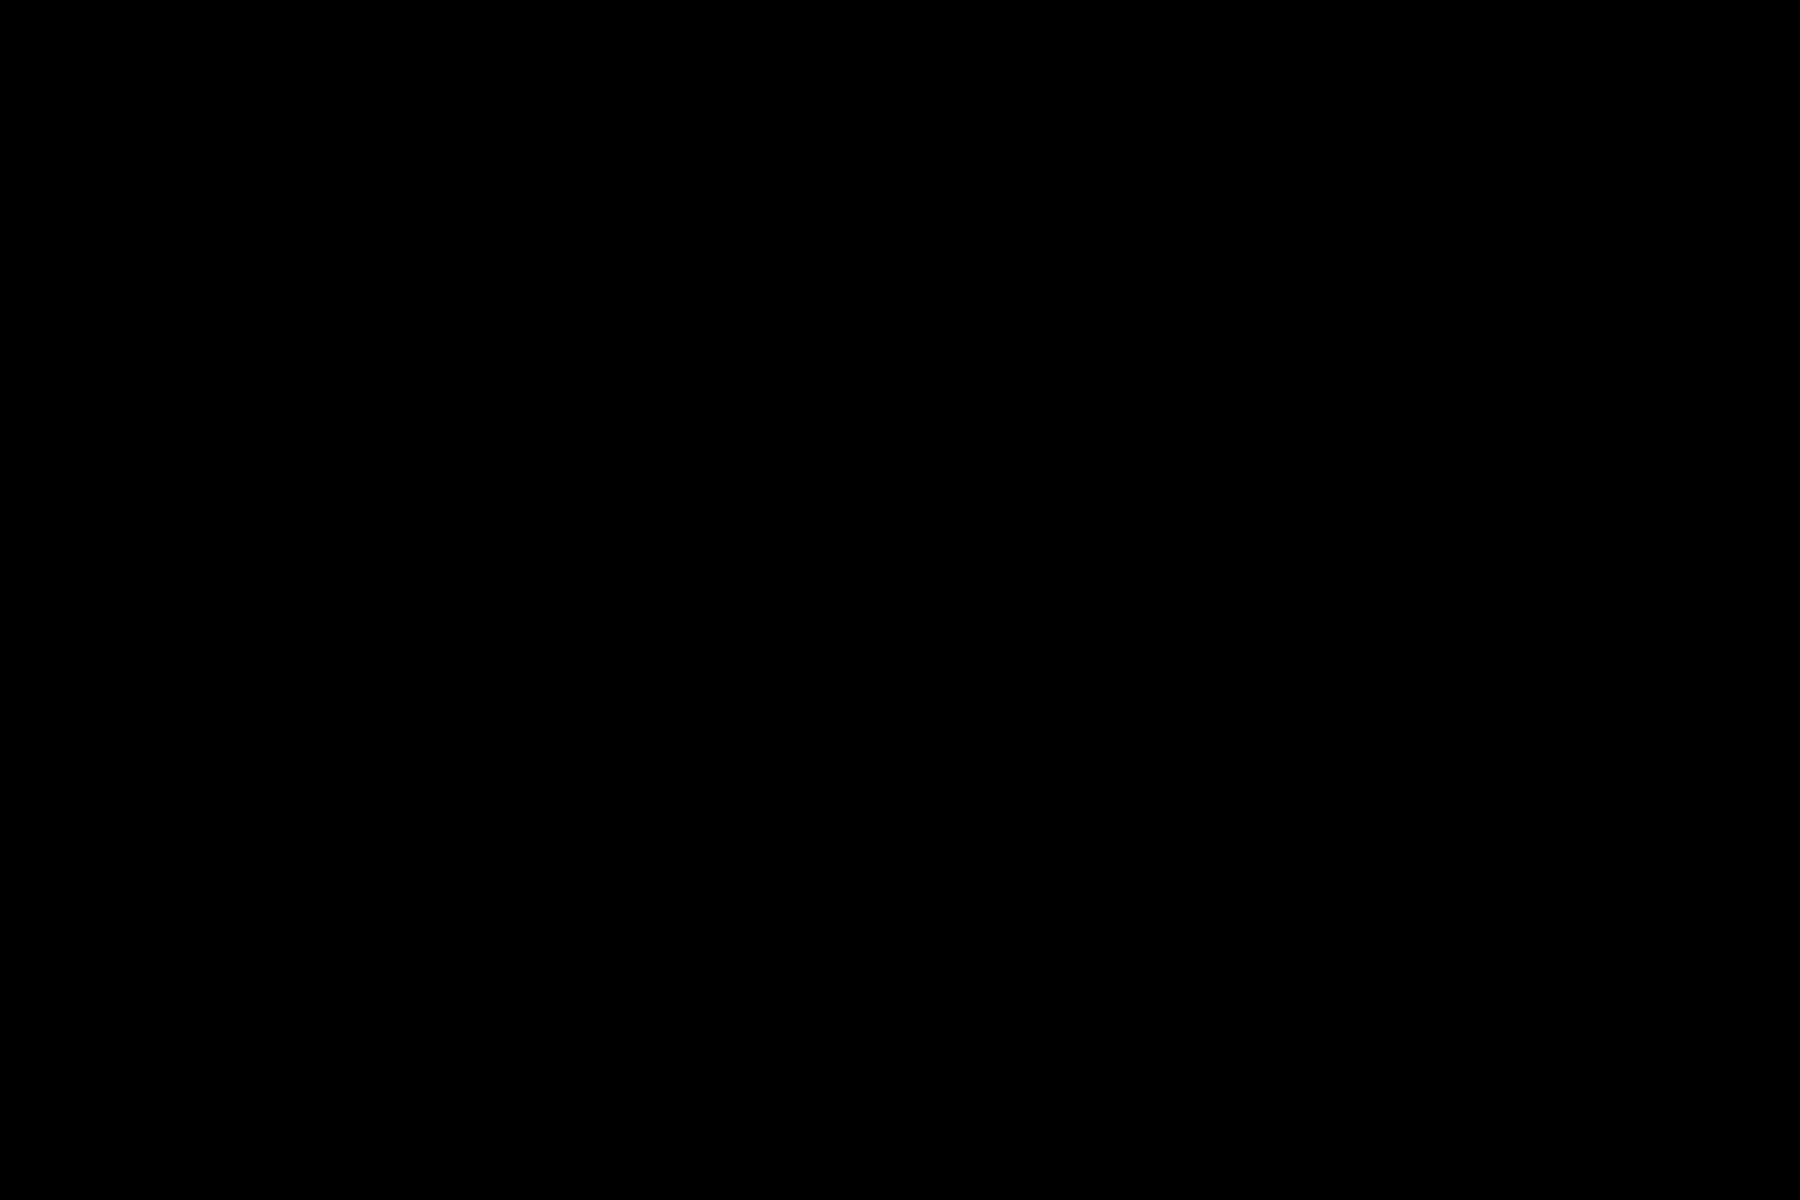 dimensional_lettering_mash-pot-detail